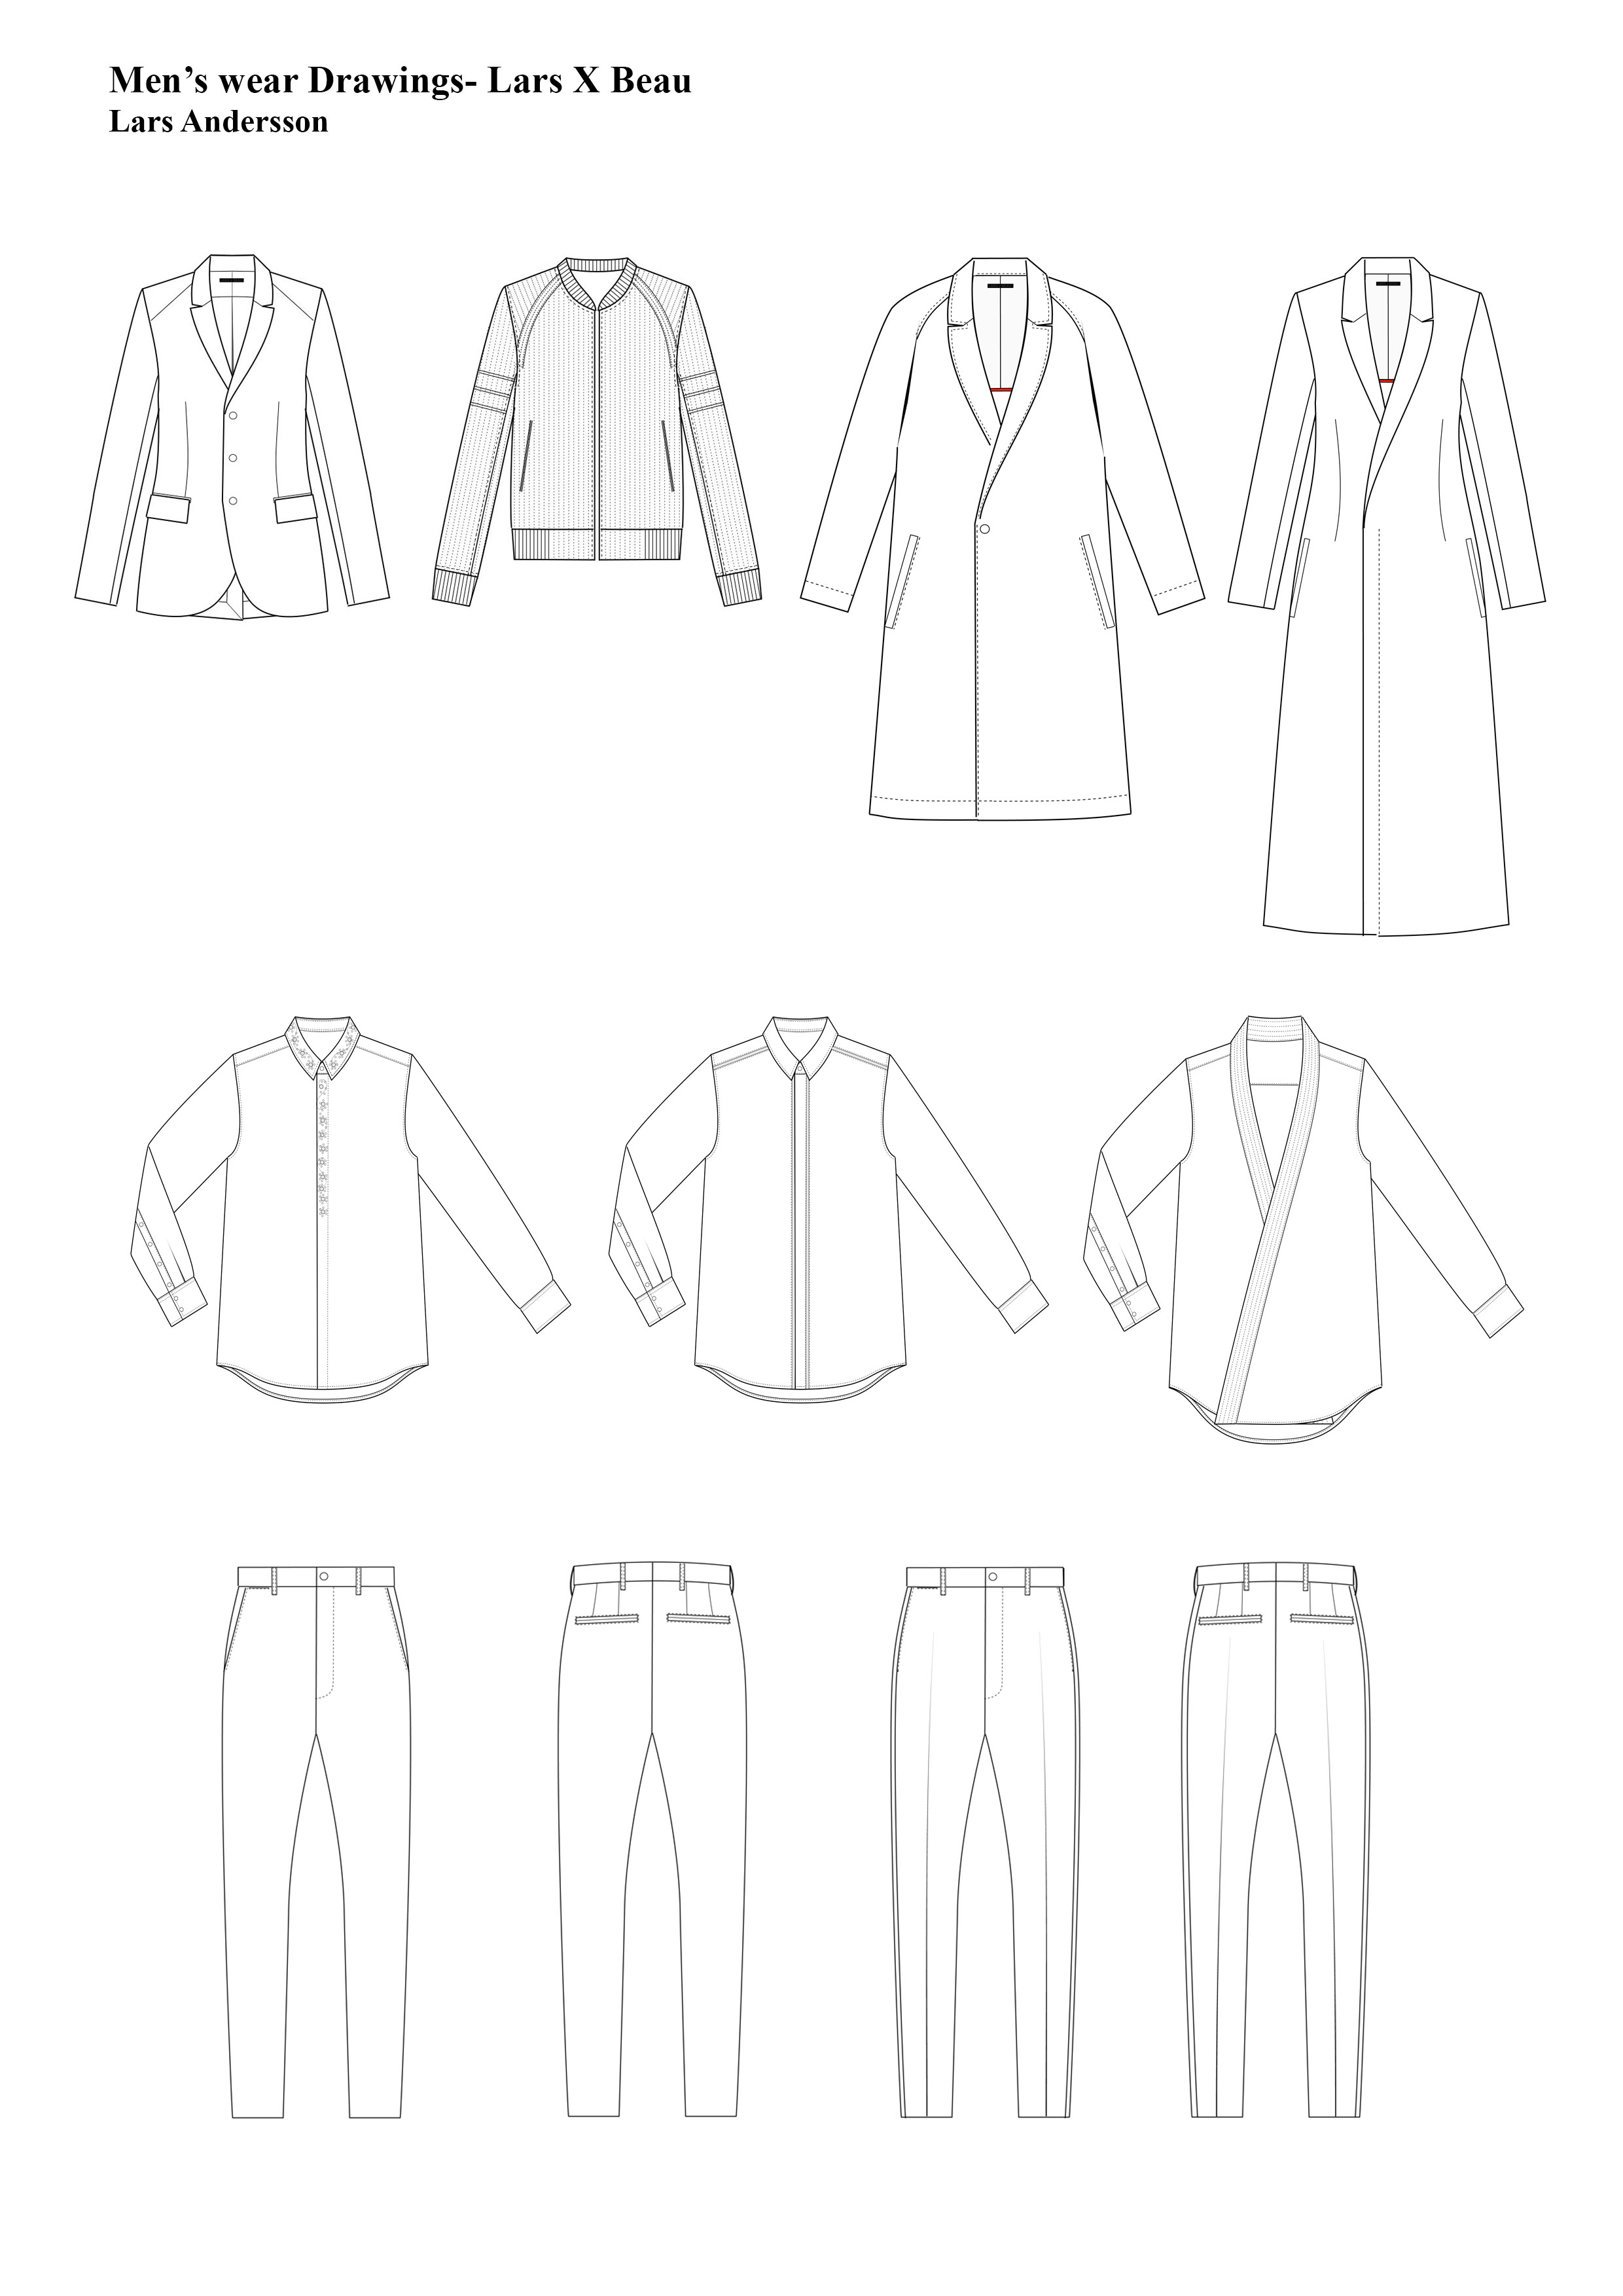 Lars-X-Beau-Drawings.jpg